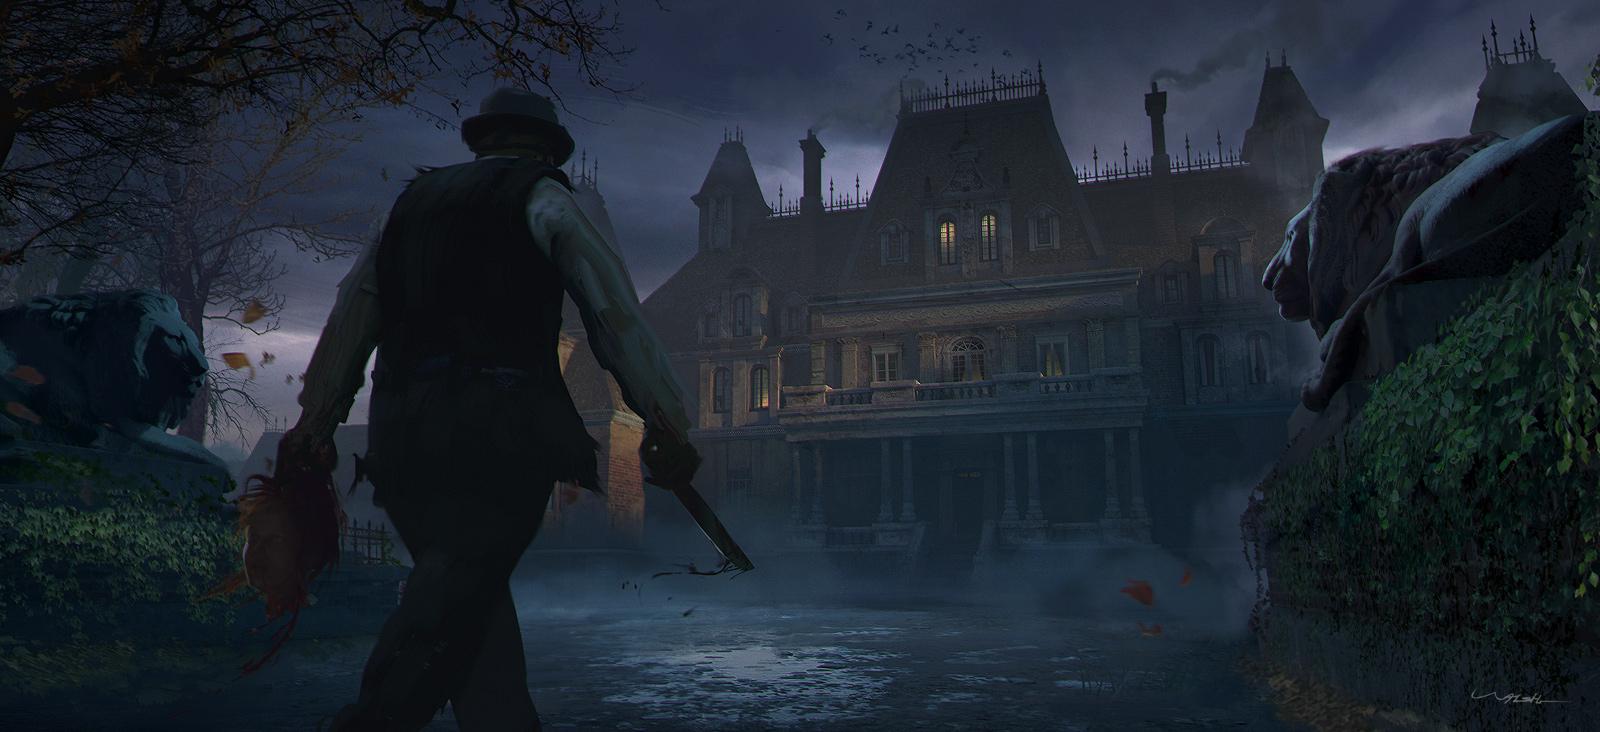 Jason The Ripper - Victorian Mansion